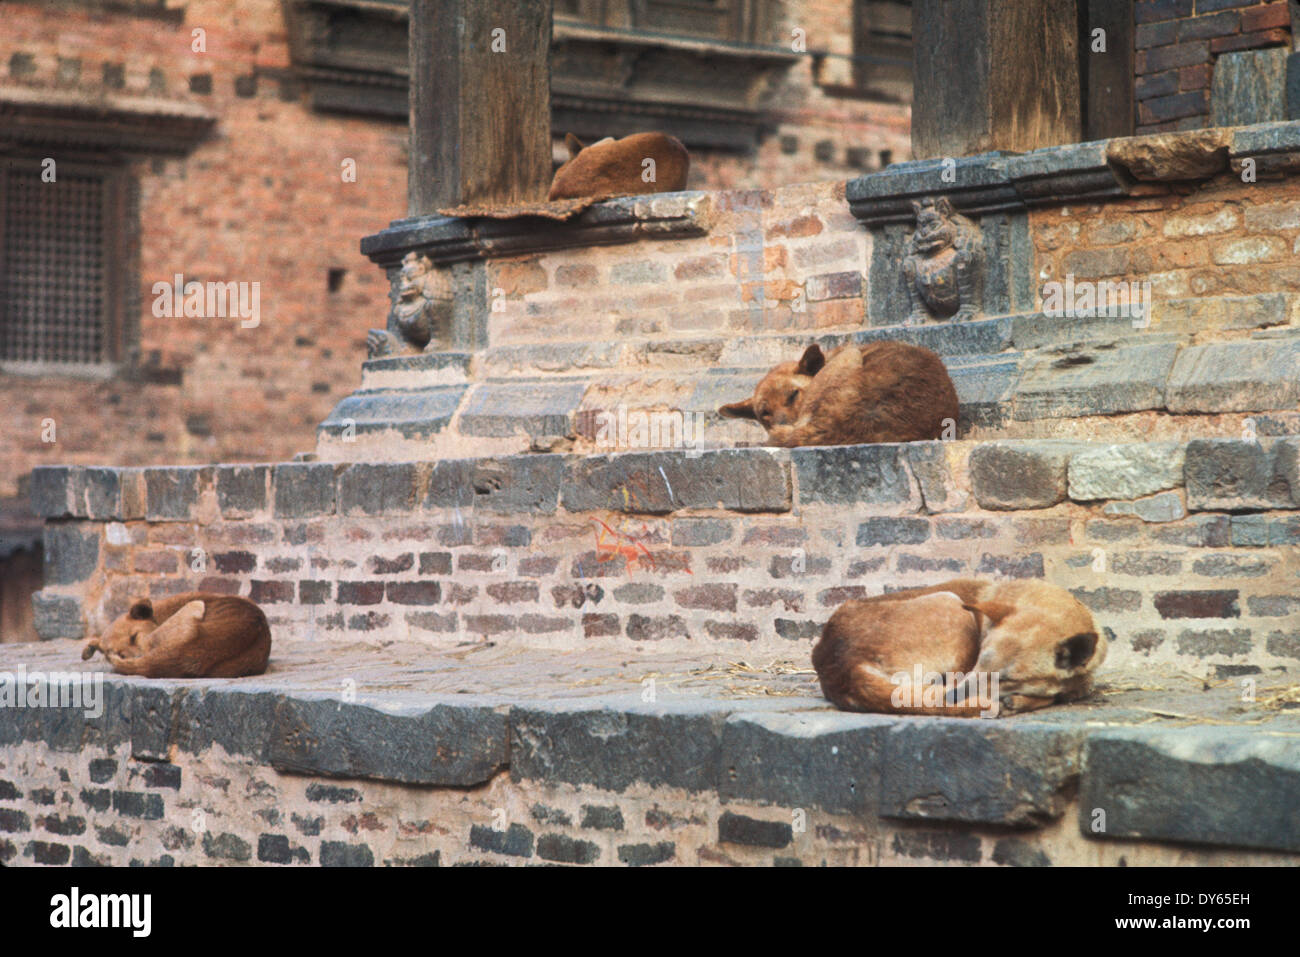 pi dogs sleep on steps of temple in Katmandu Nepal - Stock Image